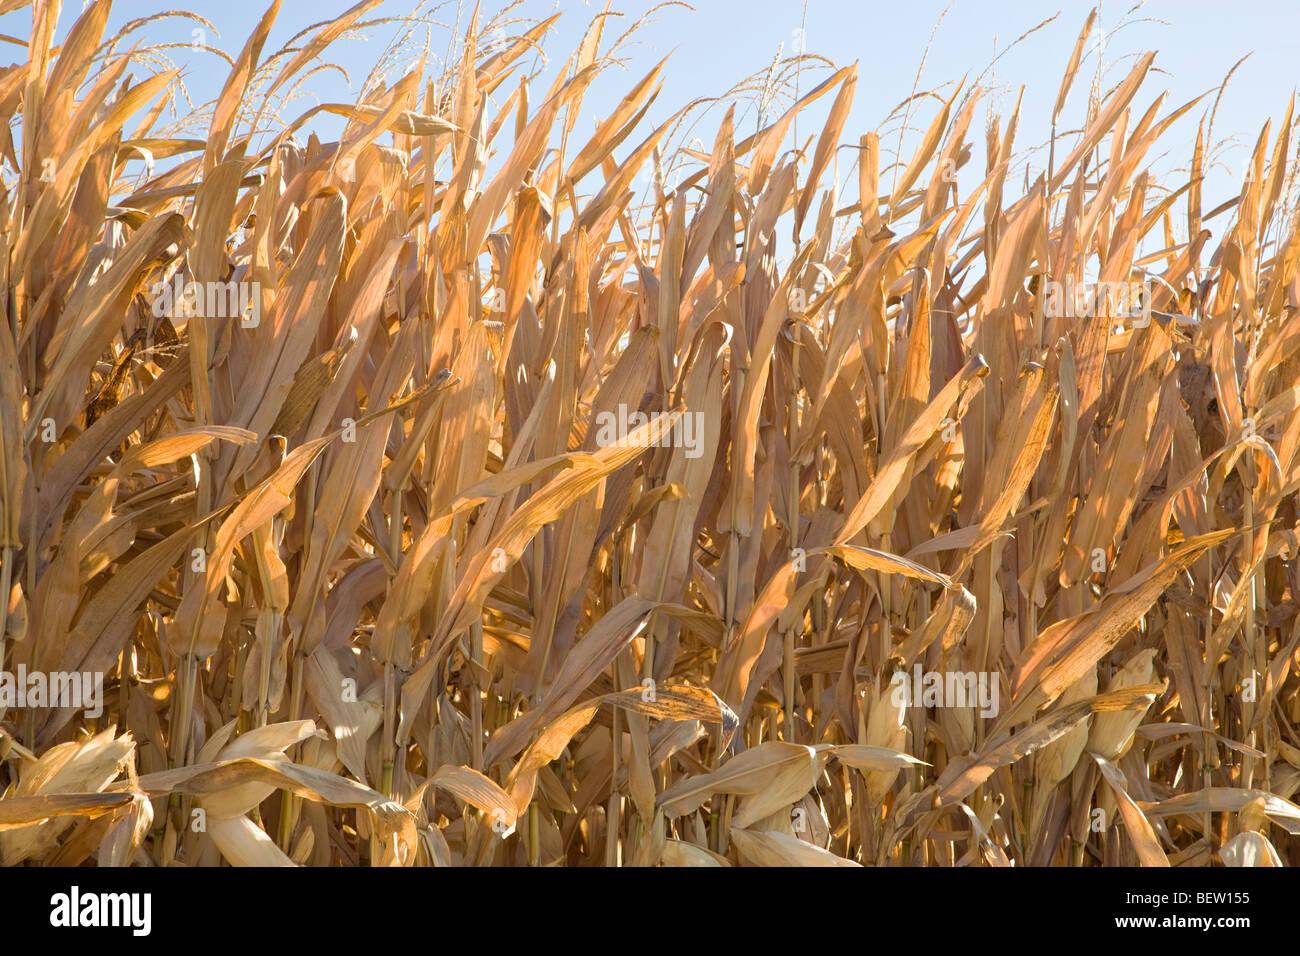 Les tiges de maïs sèches standing in field contre un ciel bleu. Photo Stock